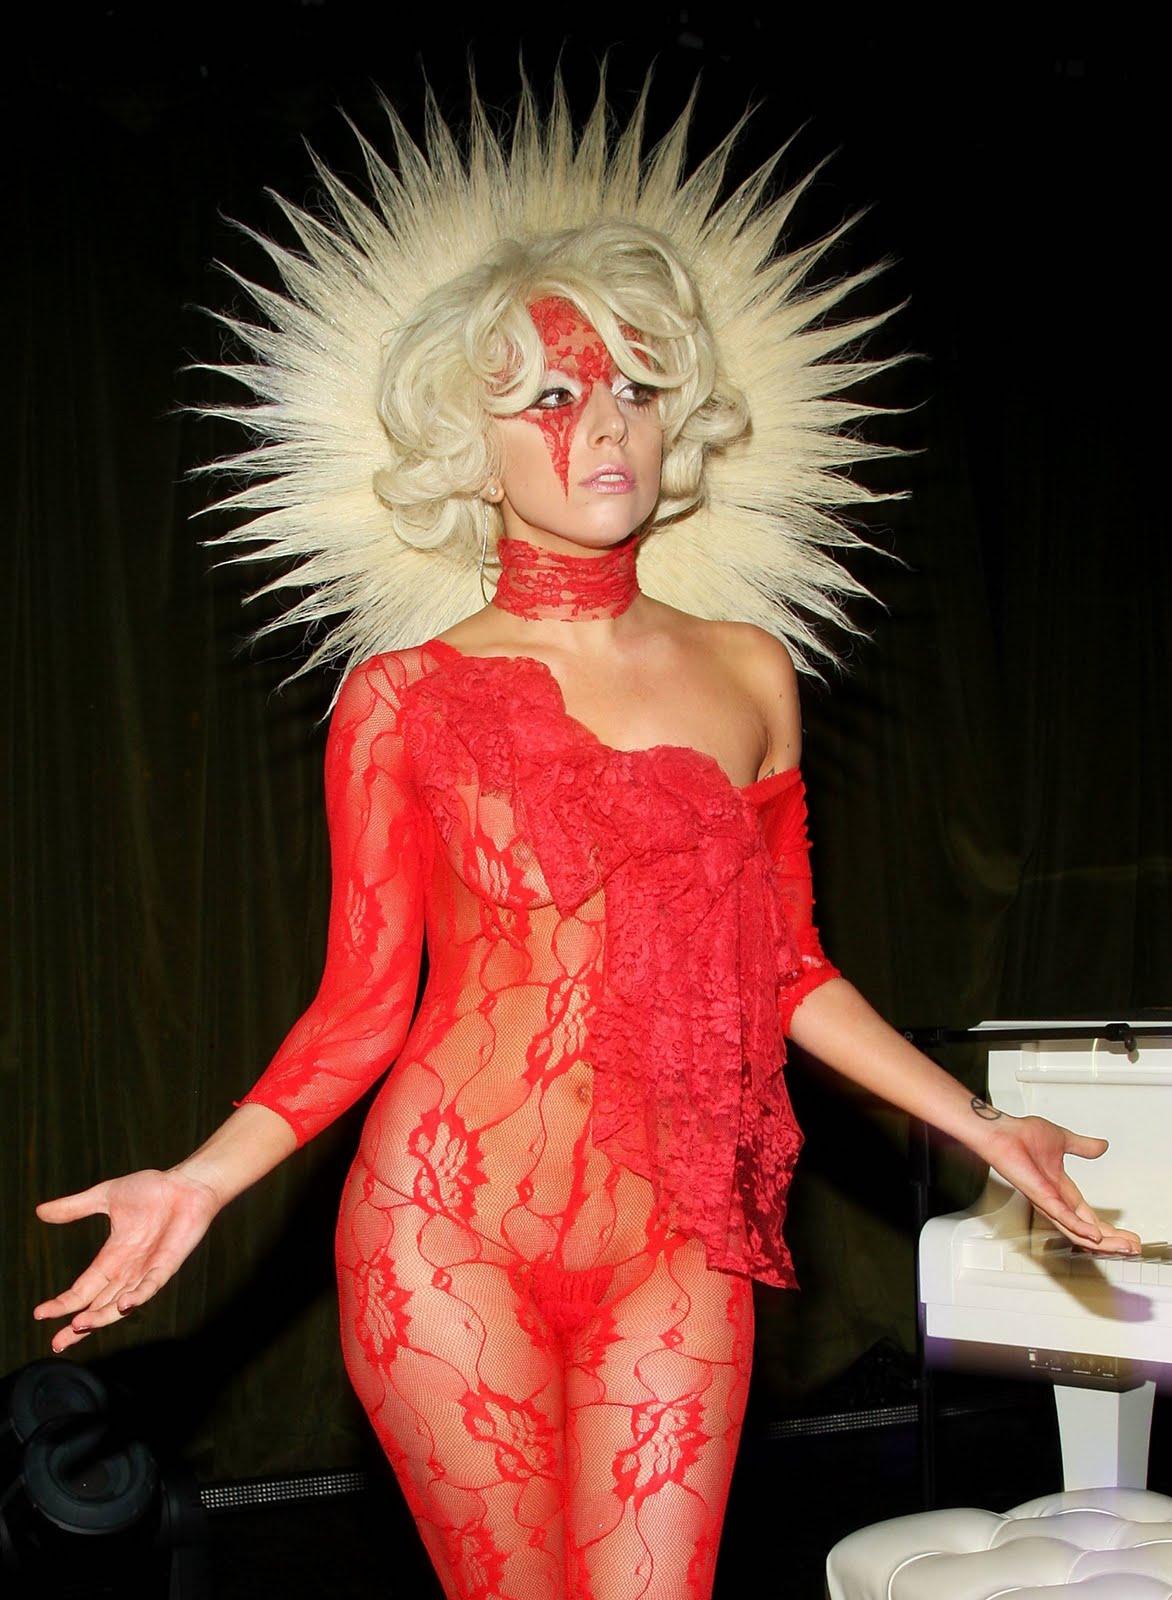 http://4.bp.blogspot.com/-LTk9YzrPsSM/Twu27K2SfGI/AAAAAAAAZAU/5yzMOc1uYRU/s1600/FOTO-Lady-GaGa-70.jpg